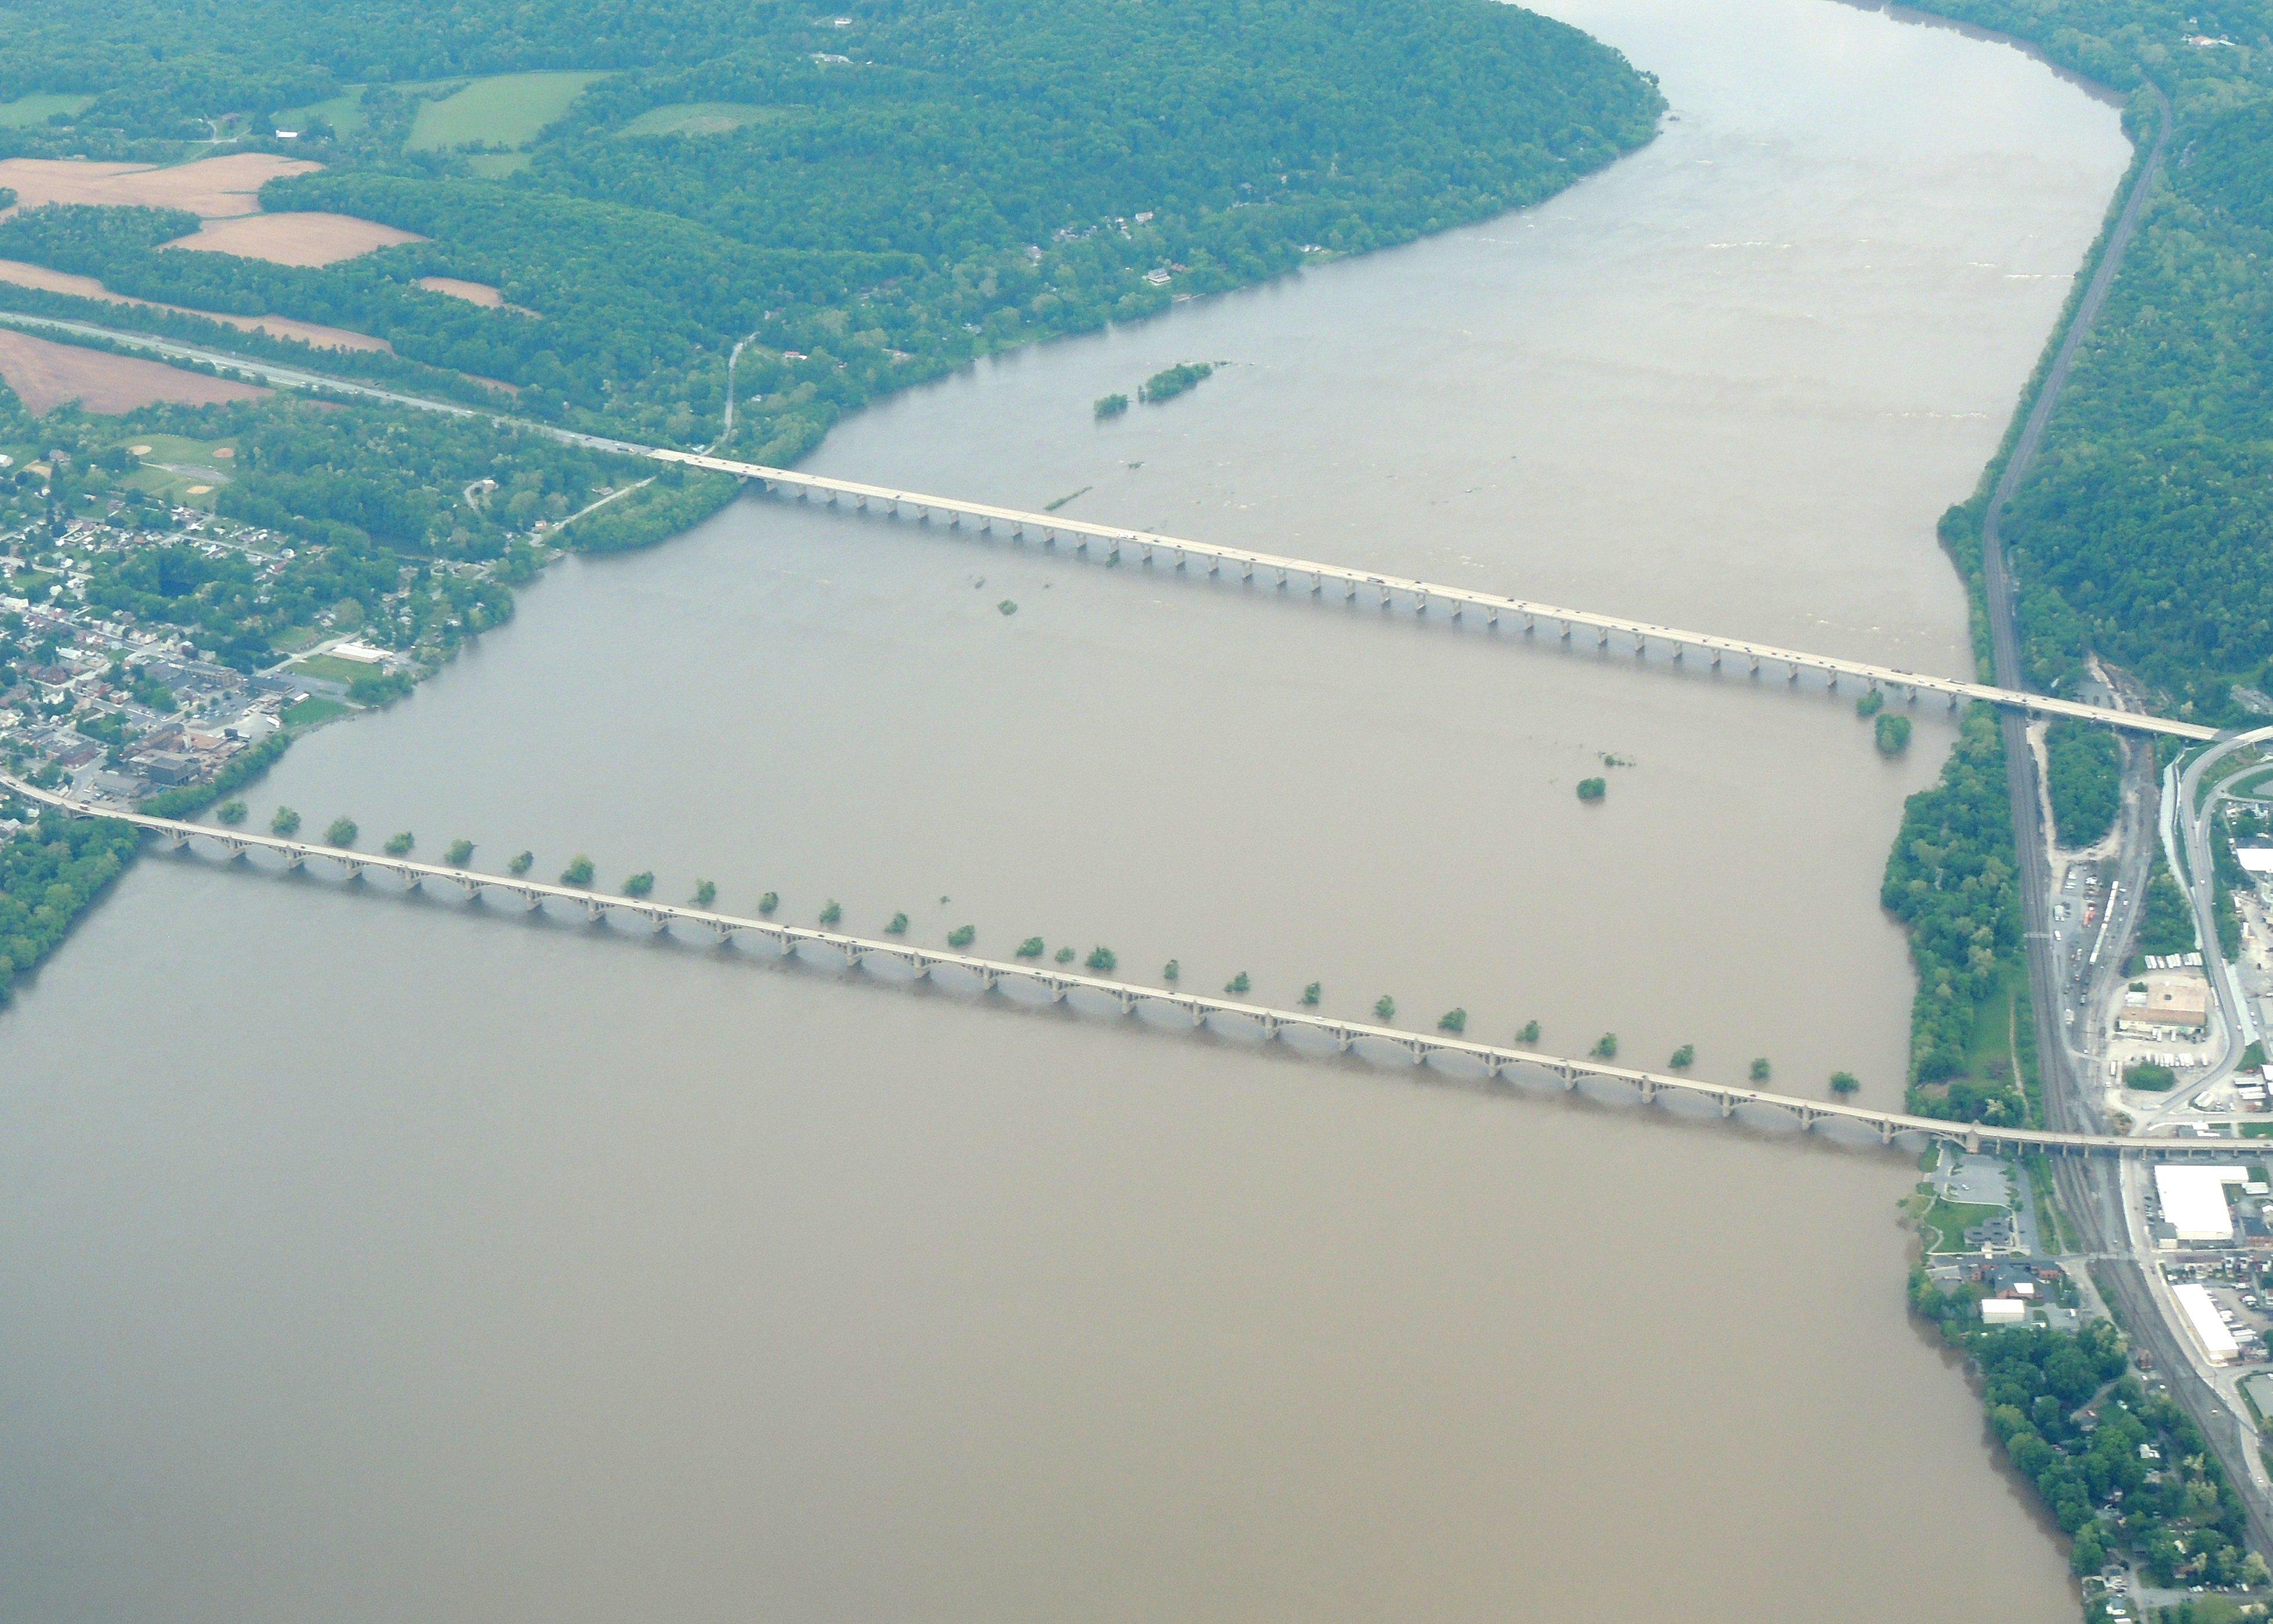 Bridges over the Susquehanna River